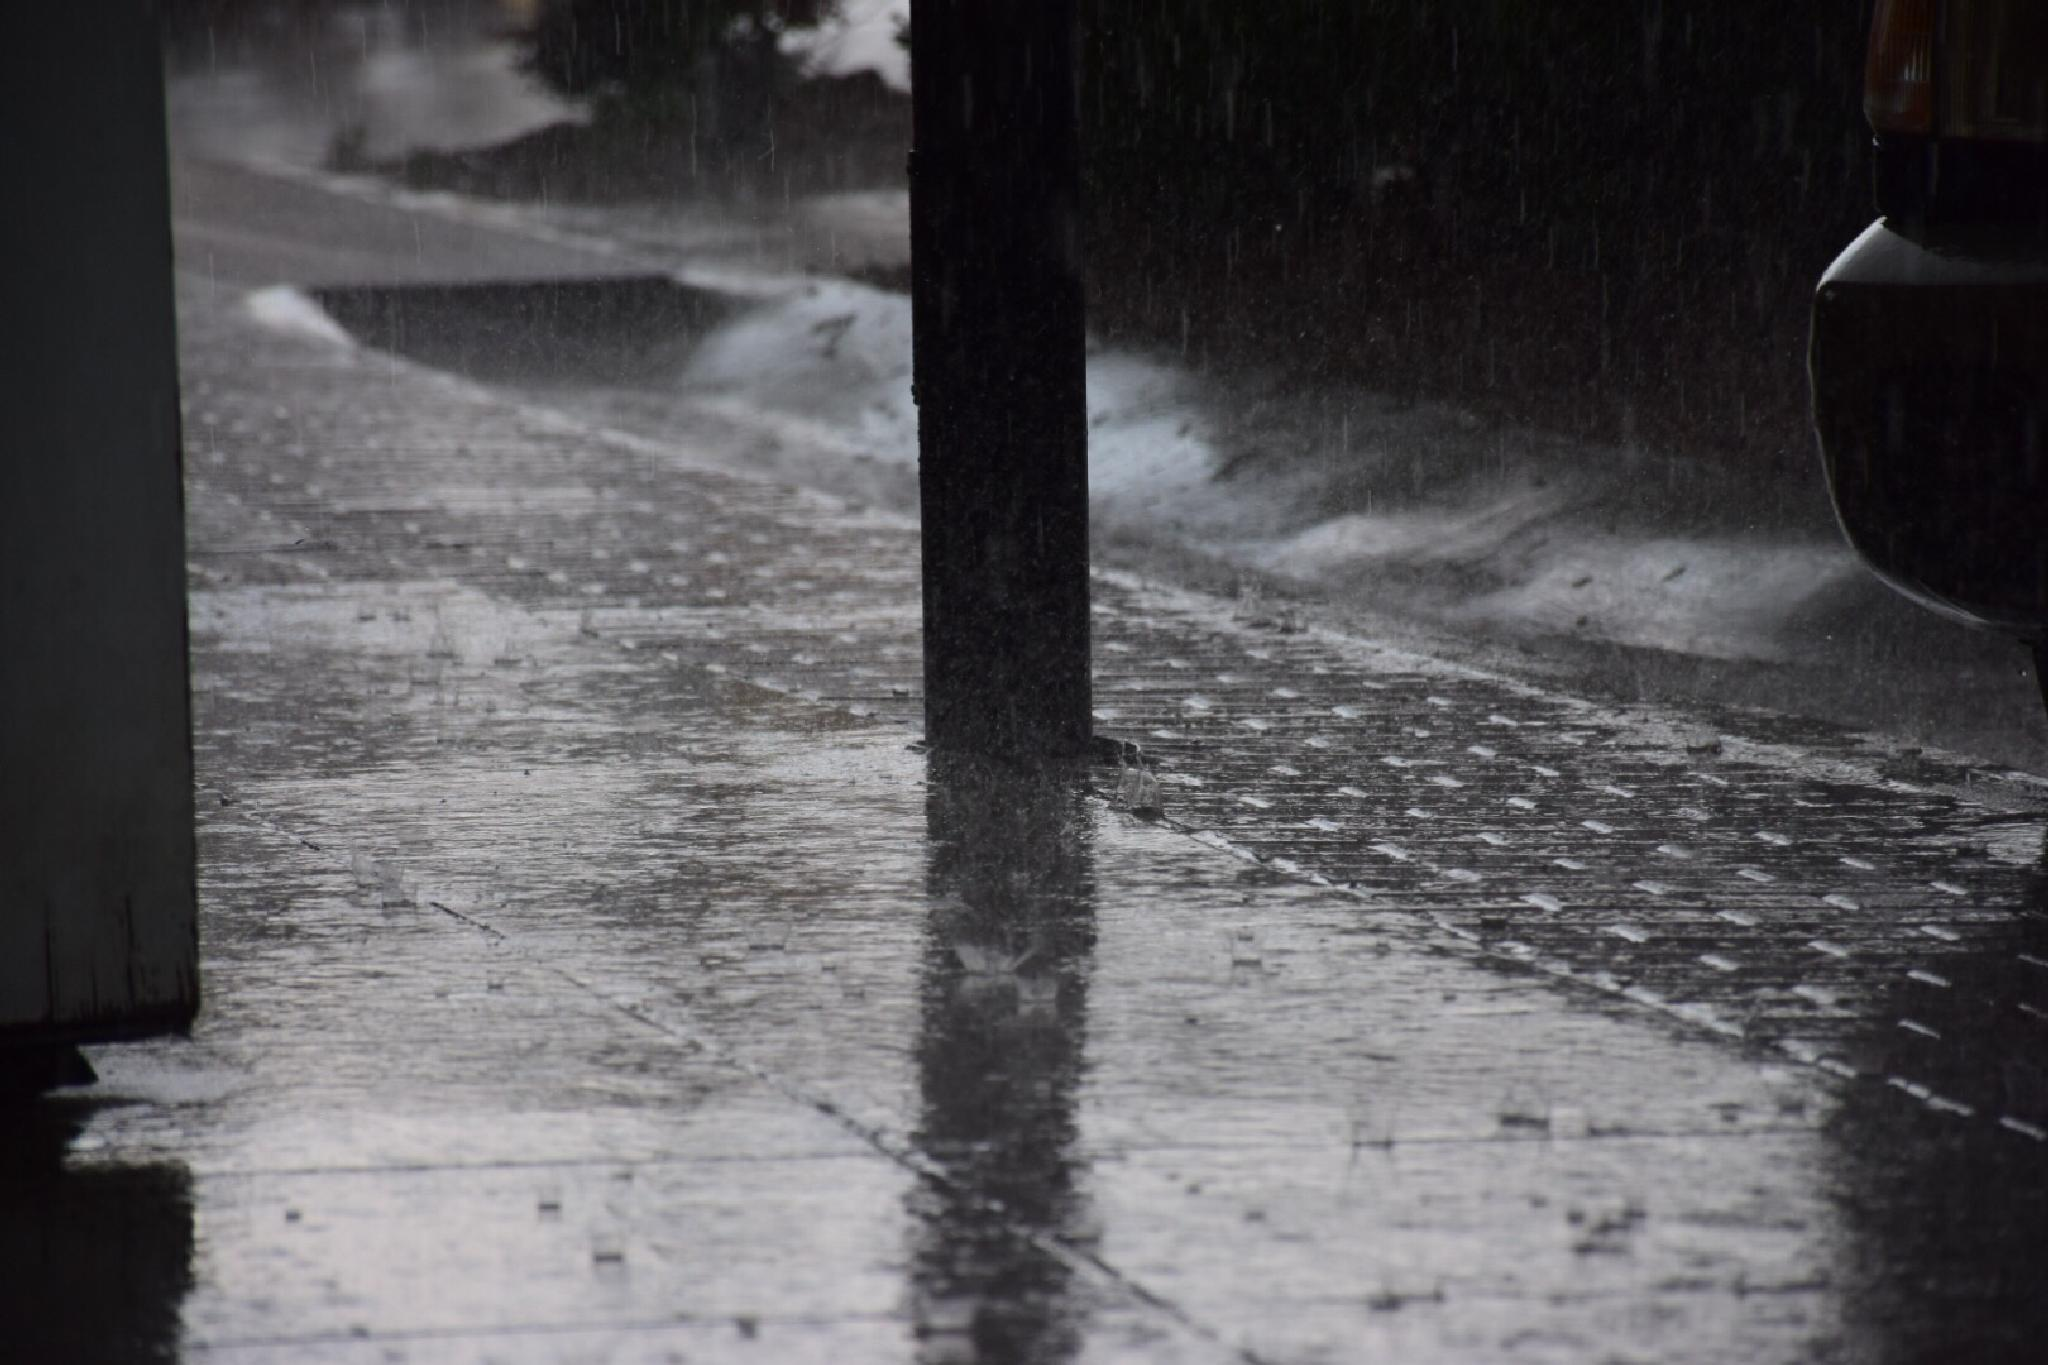 Ashe County Rain by Jay Chamberlain